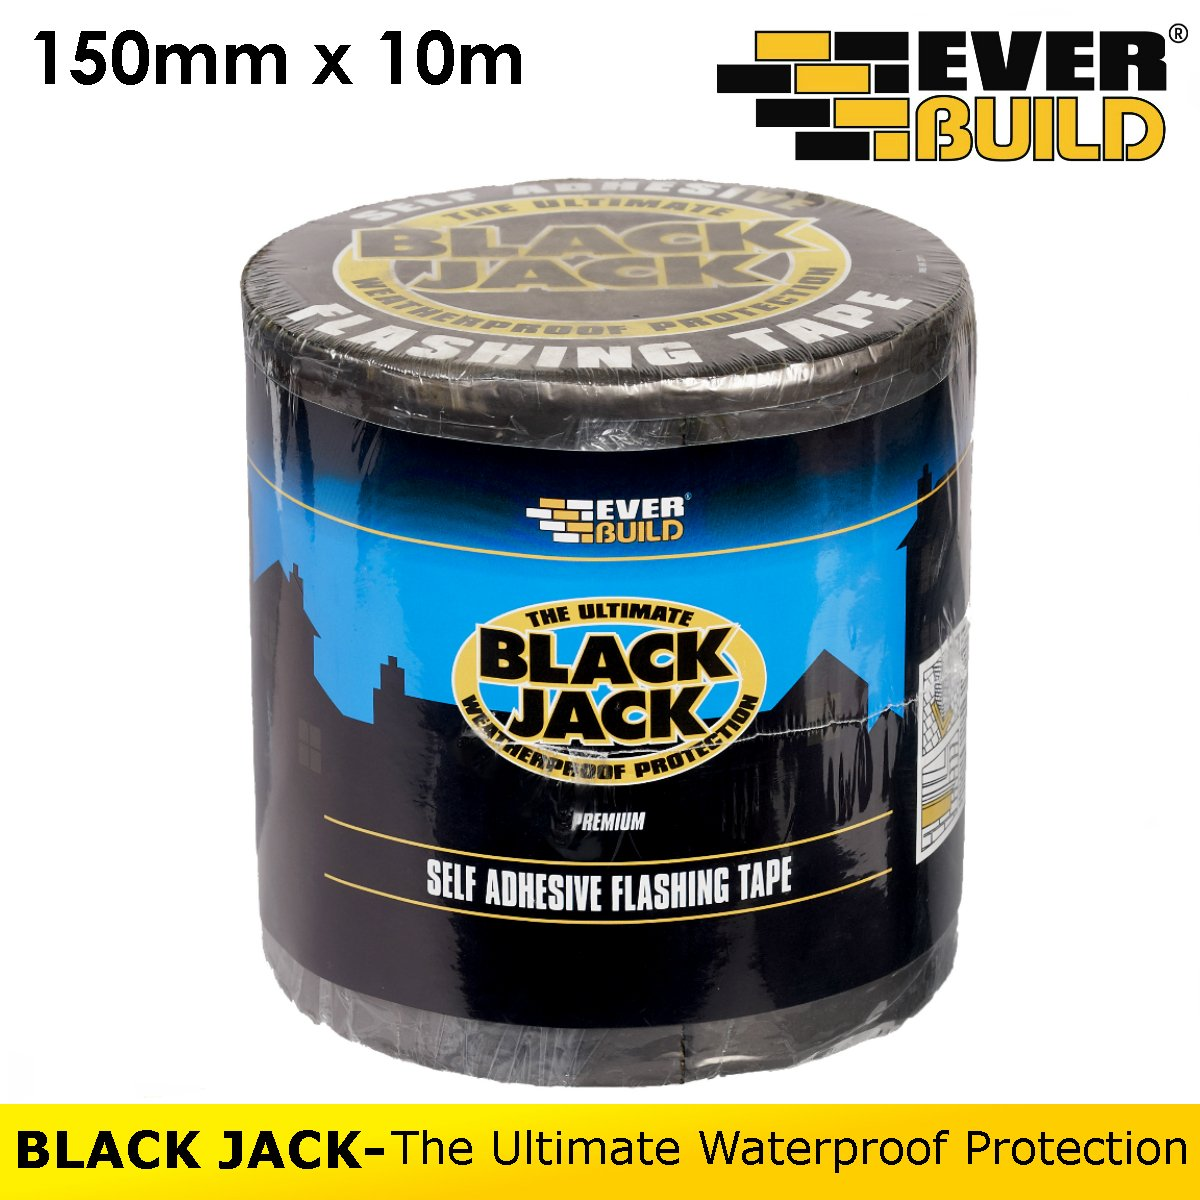 Blackjack rifle